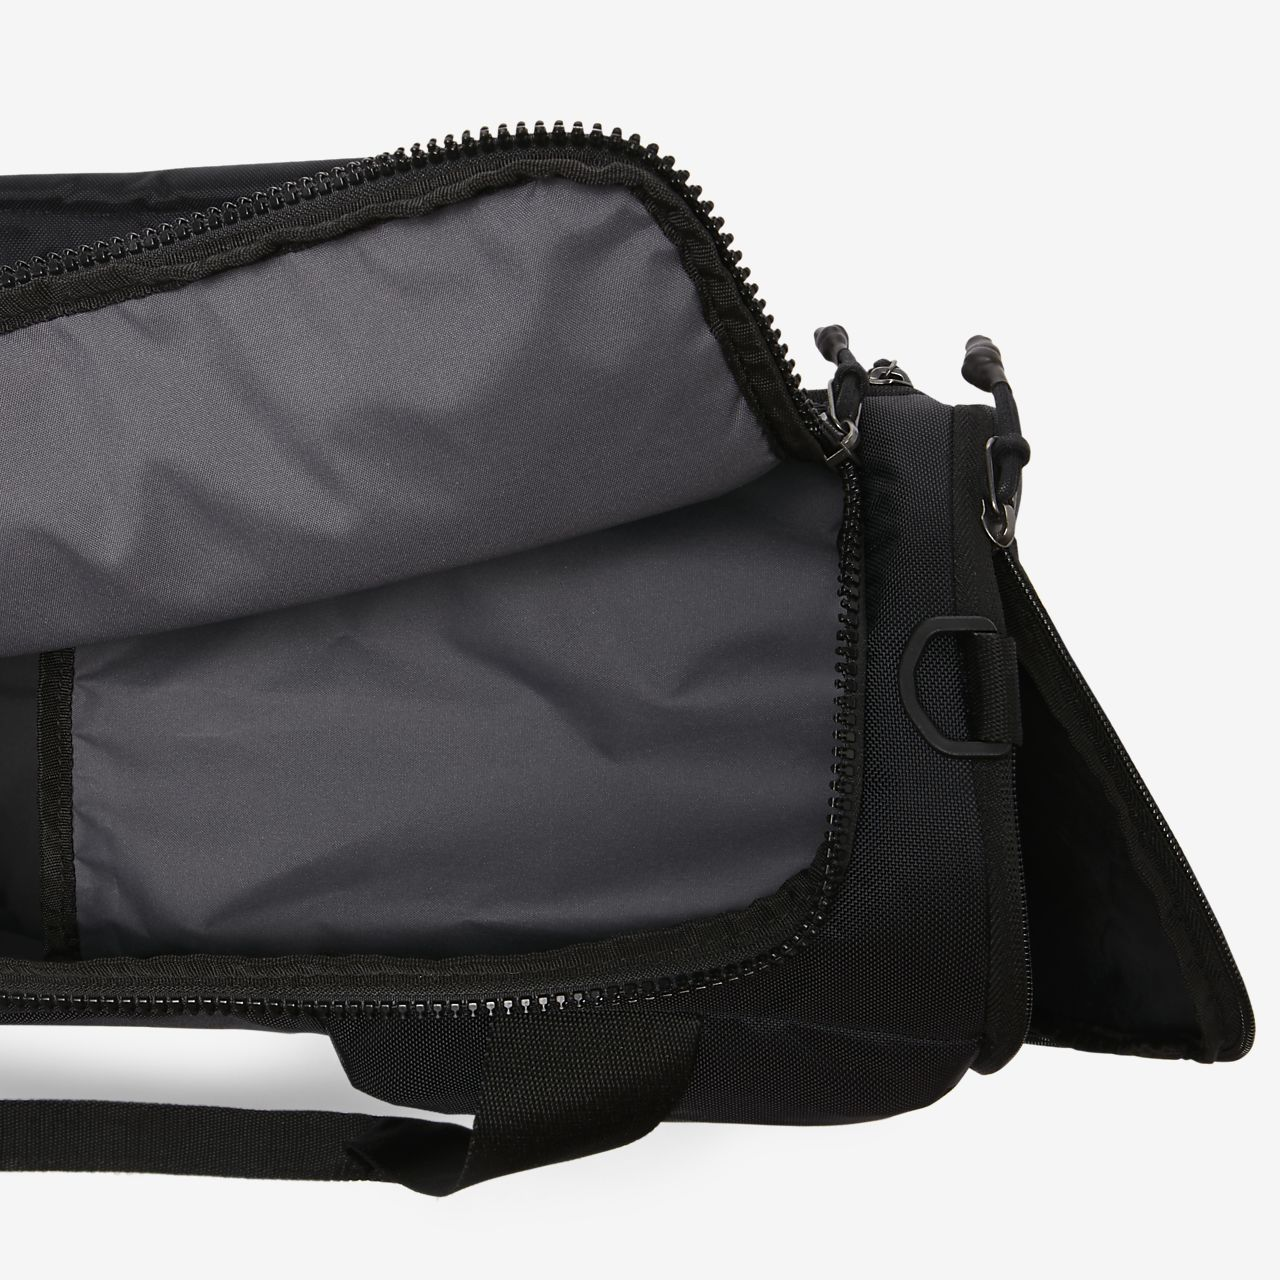 3173f11596b Nike Vapor Power Men s Training Duffel Bag (Small). Nike.com AU